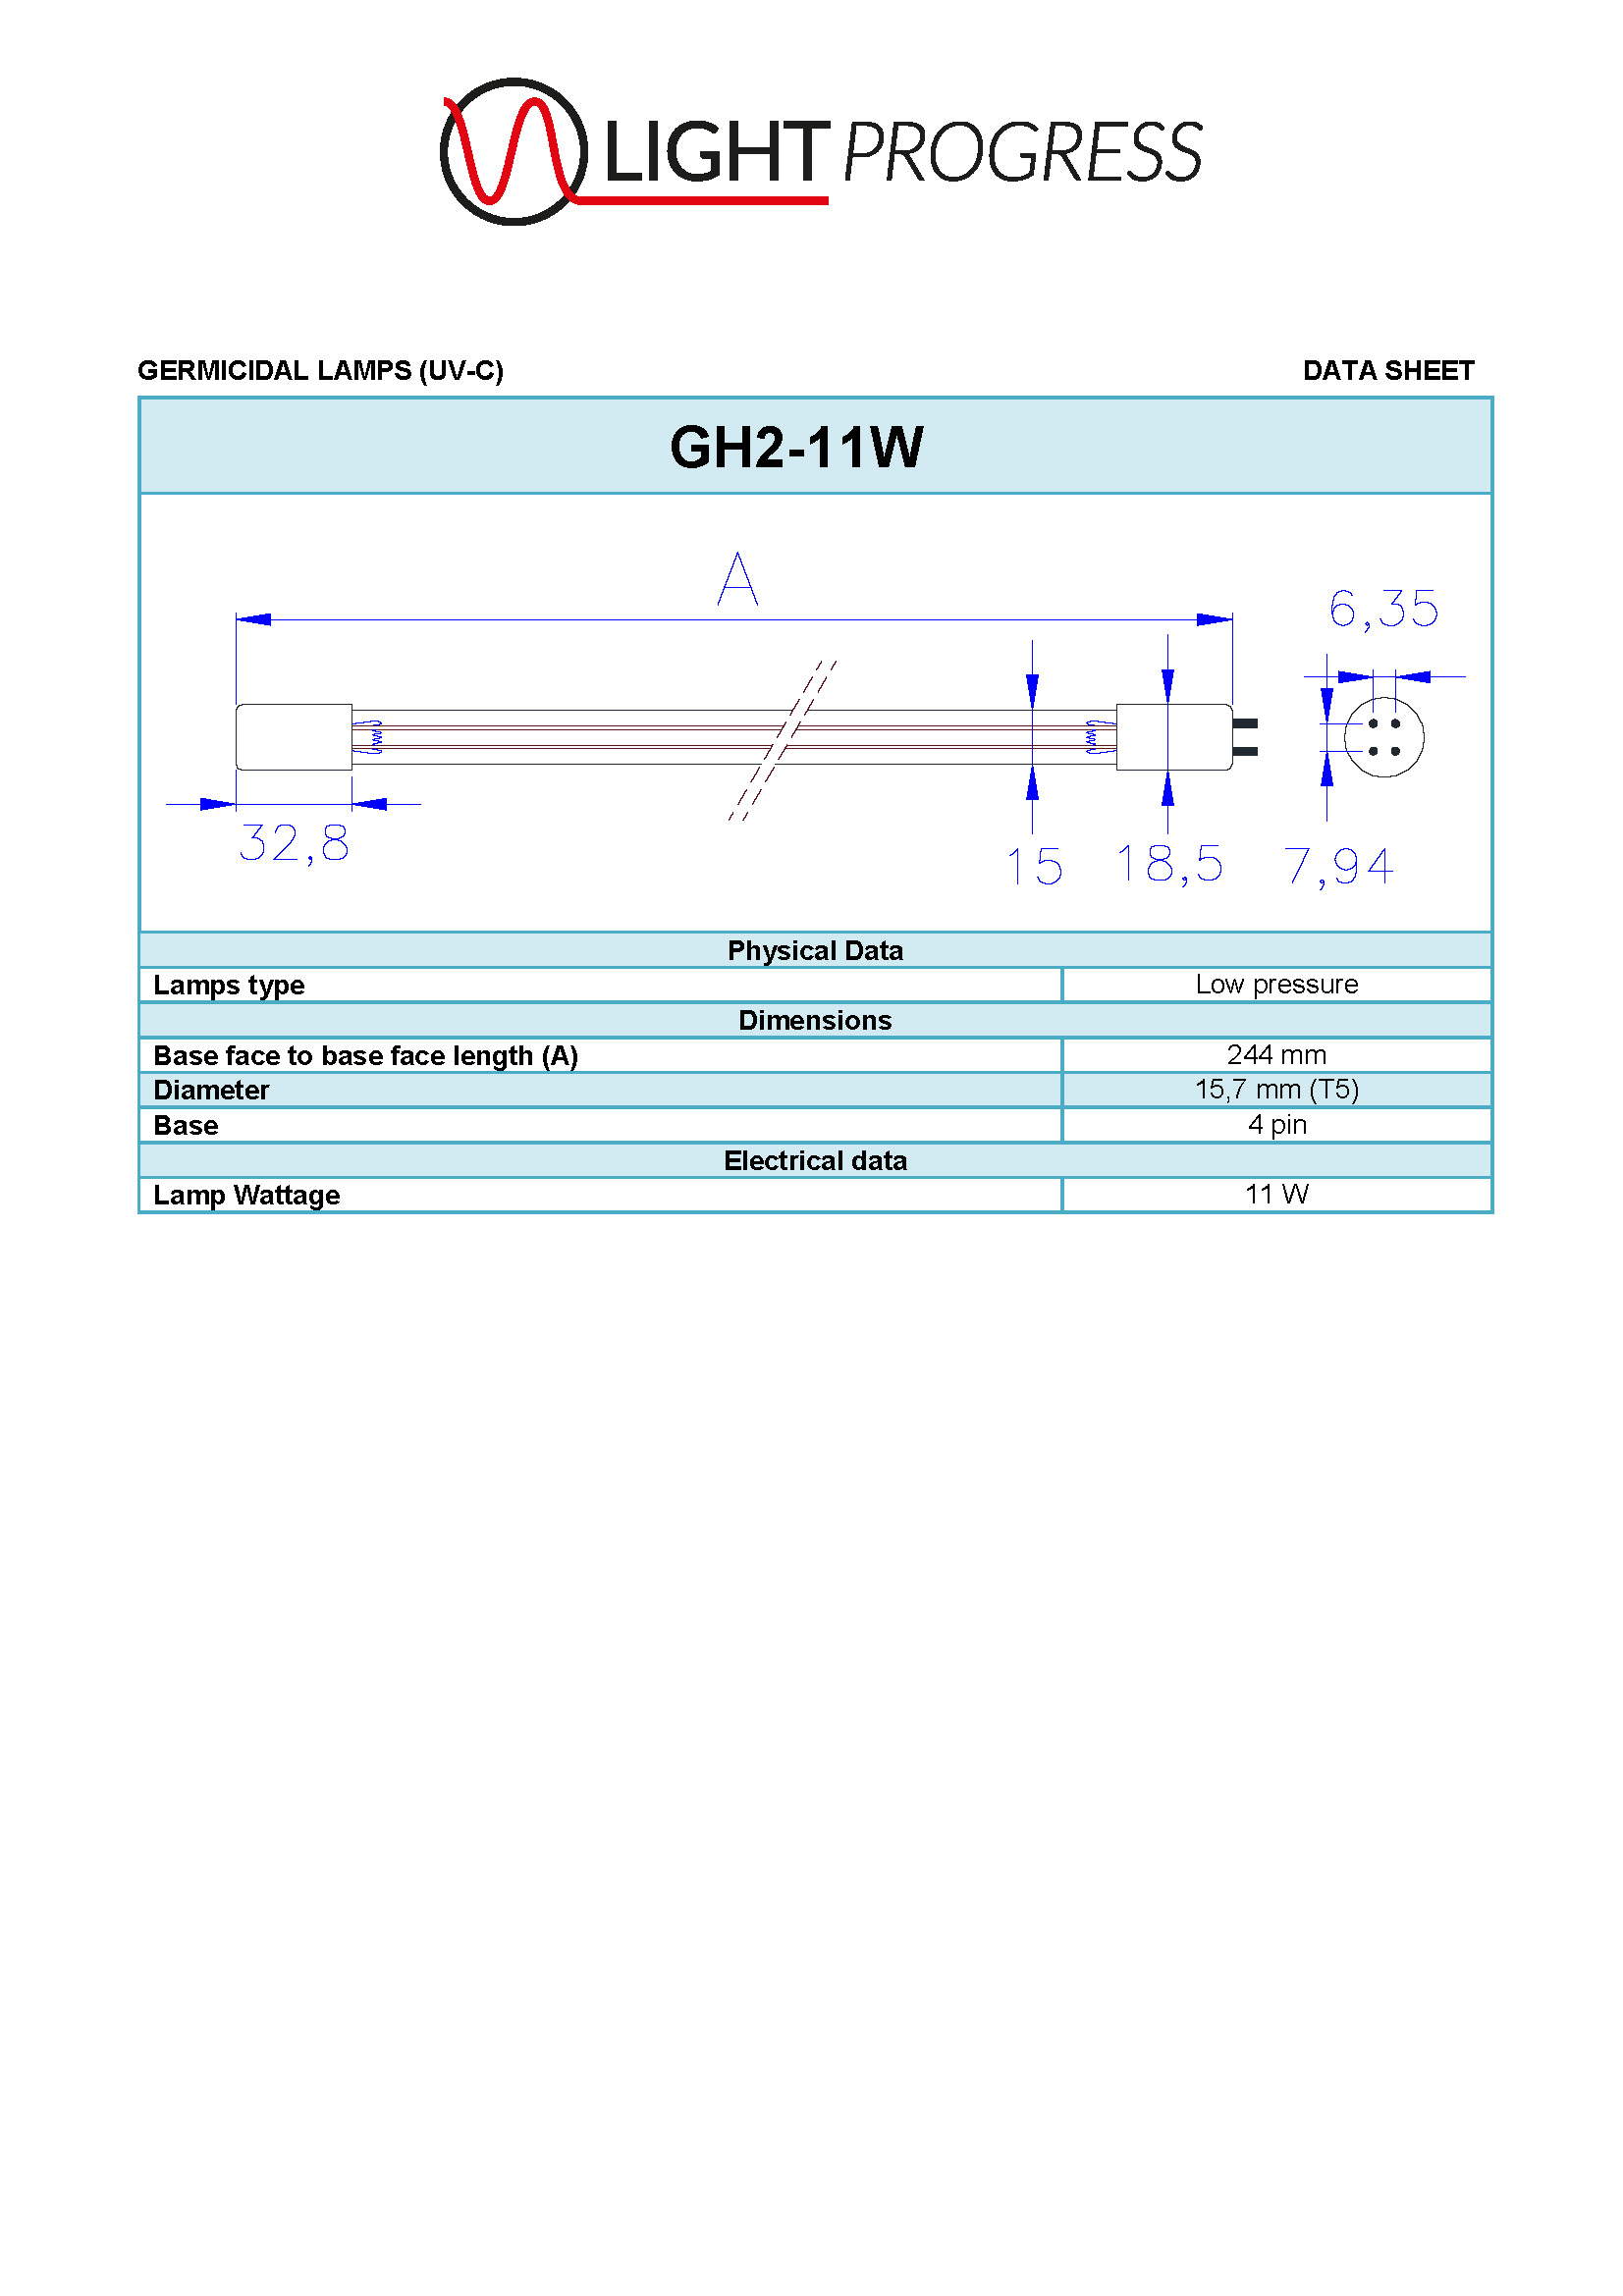 LIGHT PROGRESS GH2-11W